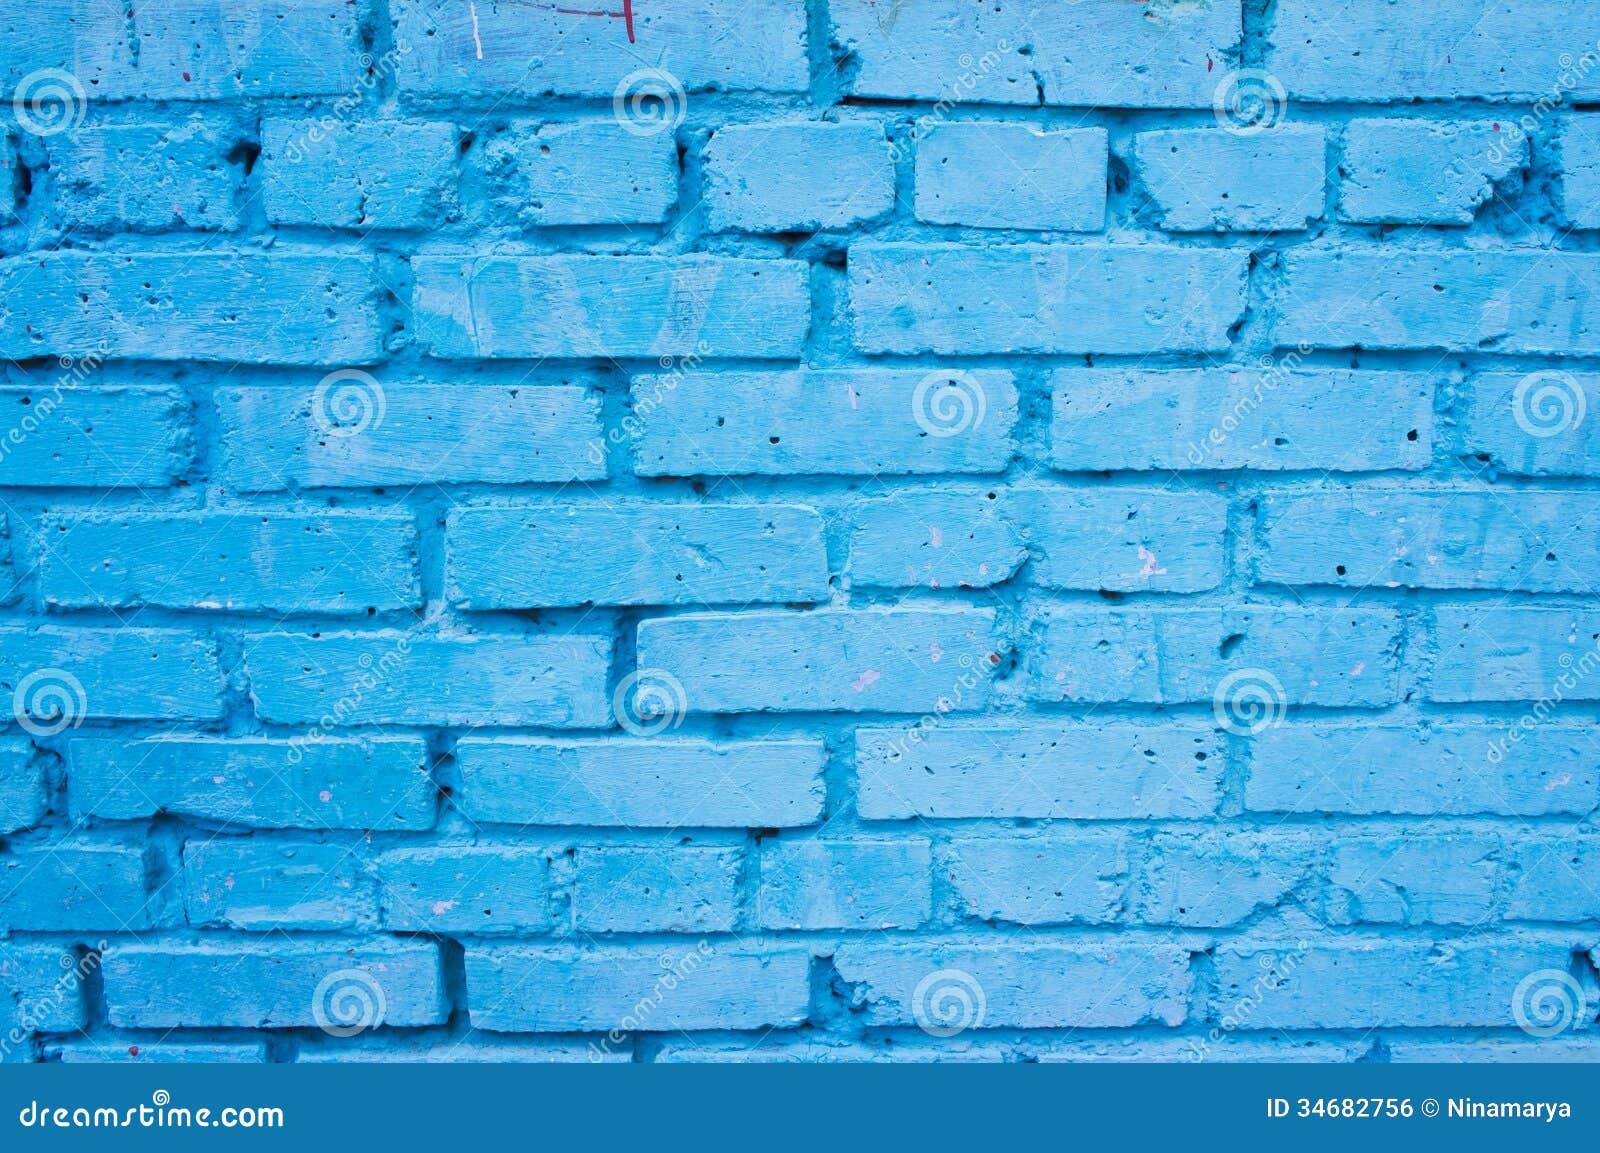 turquoise wallpaper plain